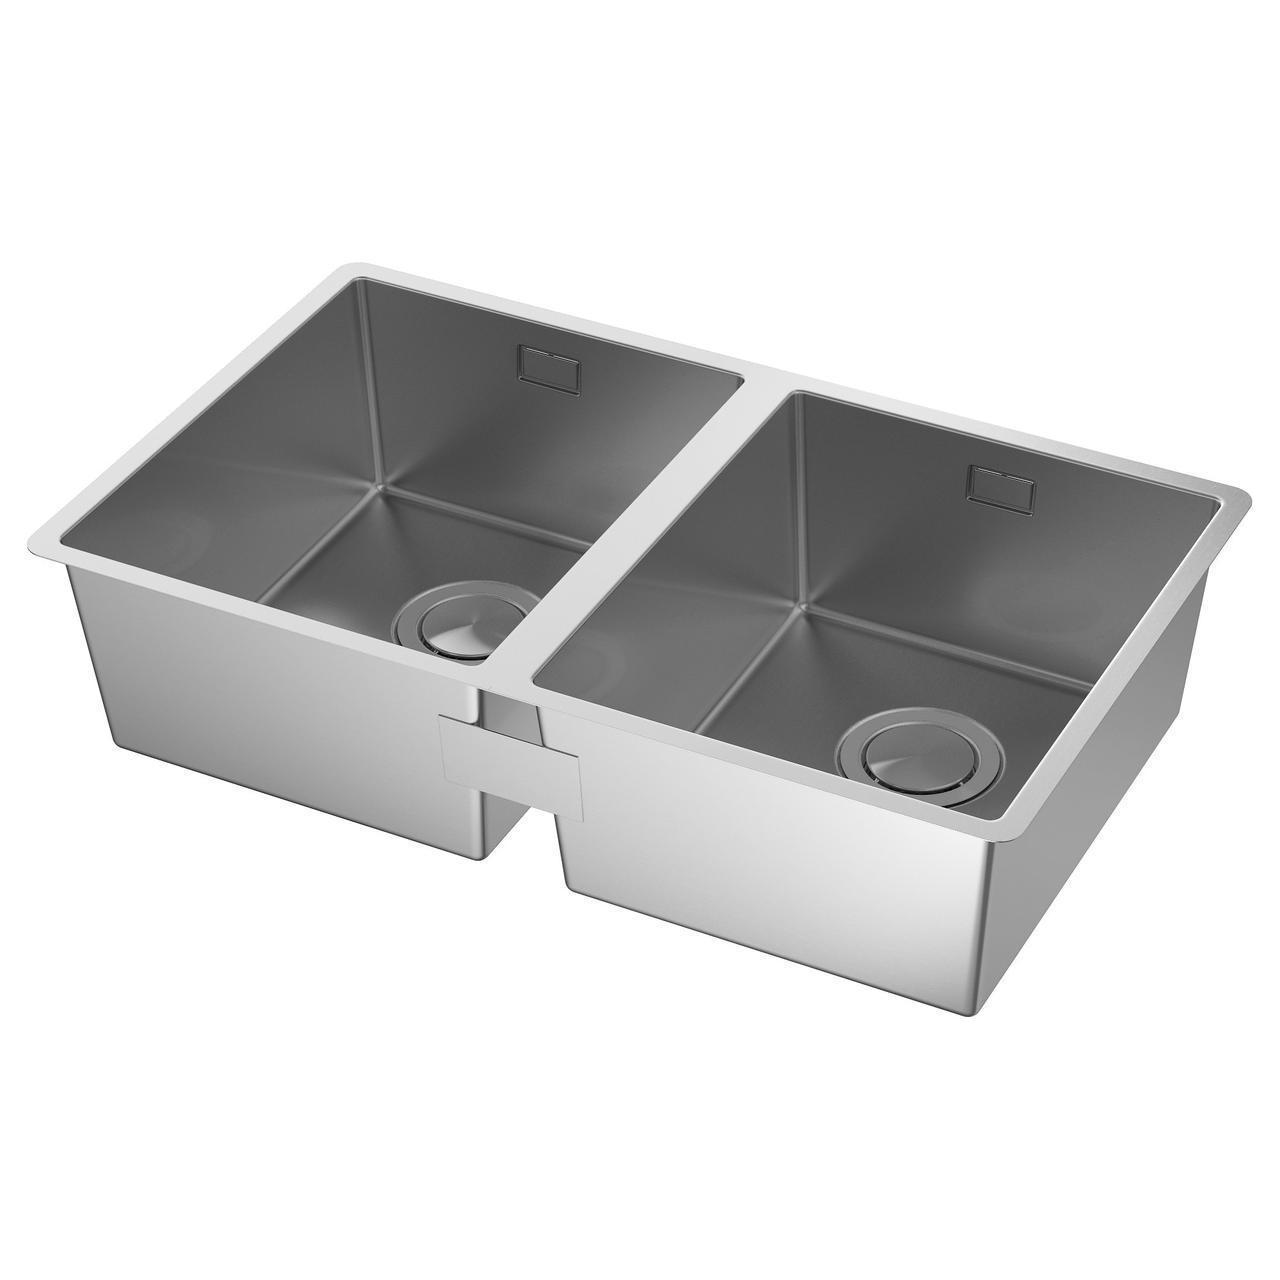 IKEA NORRSJON Двойная мойка, нержавеющая сталь  (391.579.19)